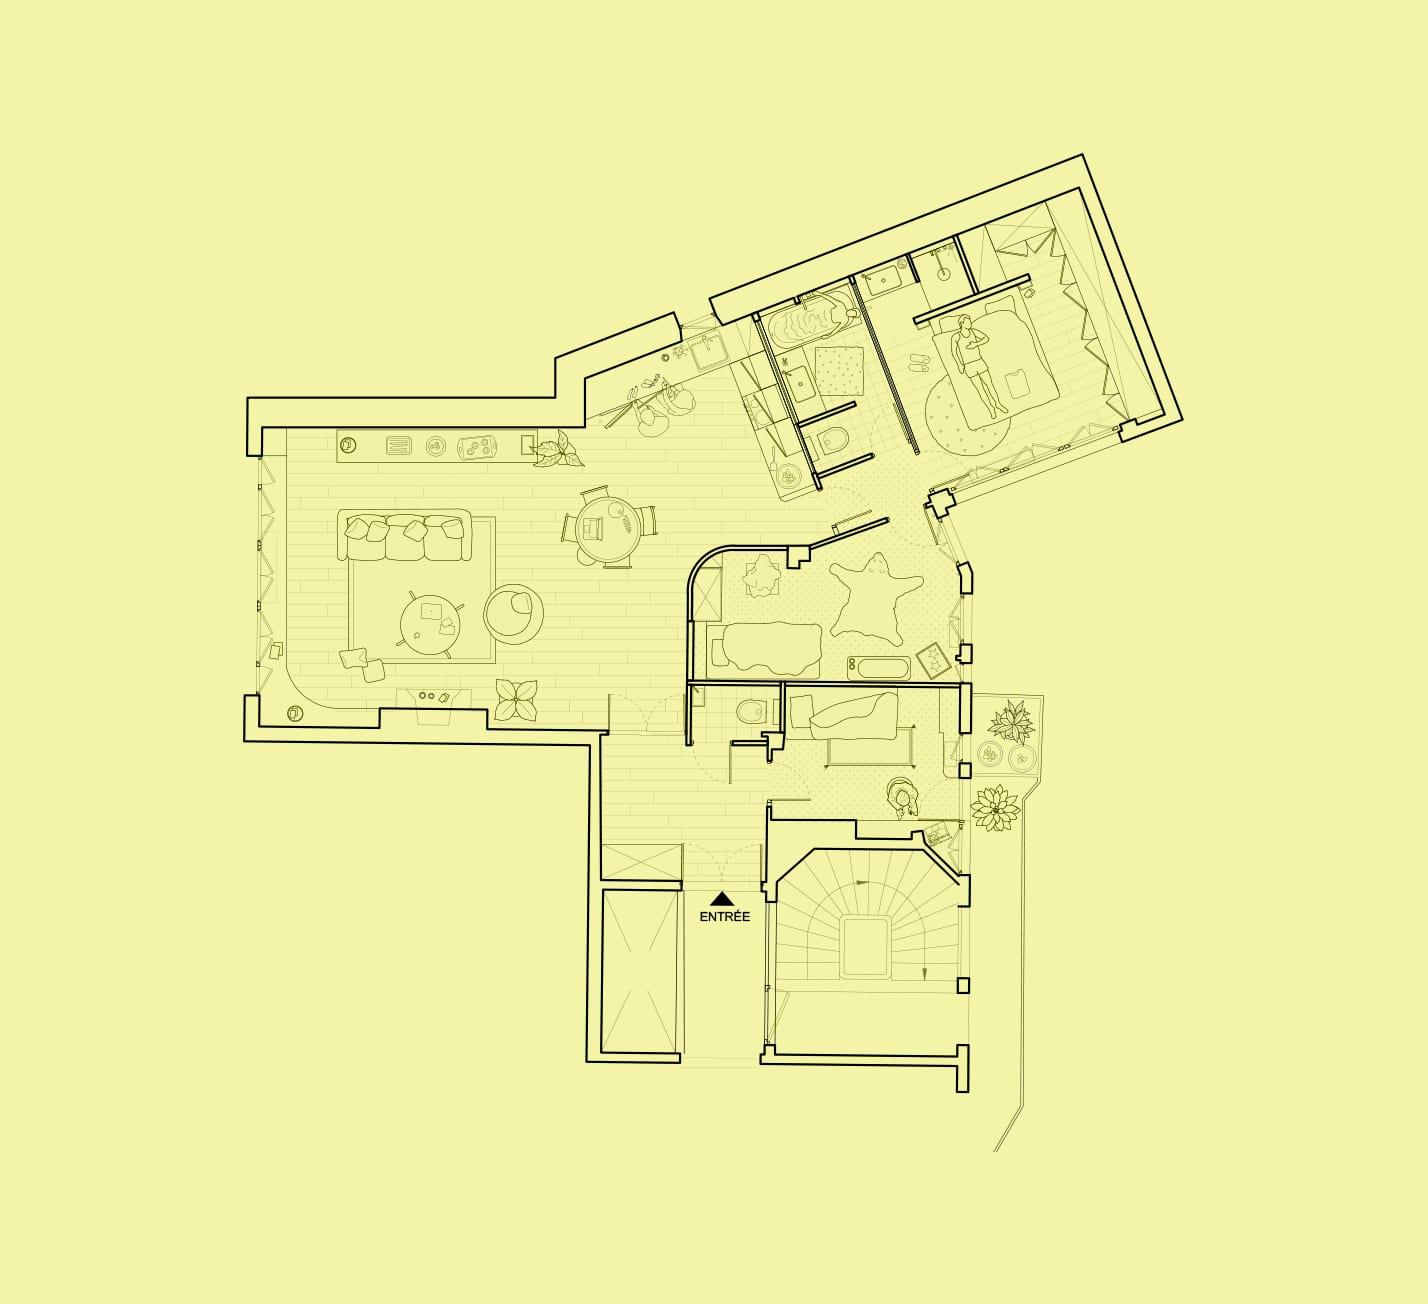 Projet-Emile-Atelier-Steve-Pauline-Borgia-Architecte-Plan-03-min